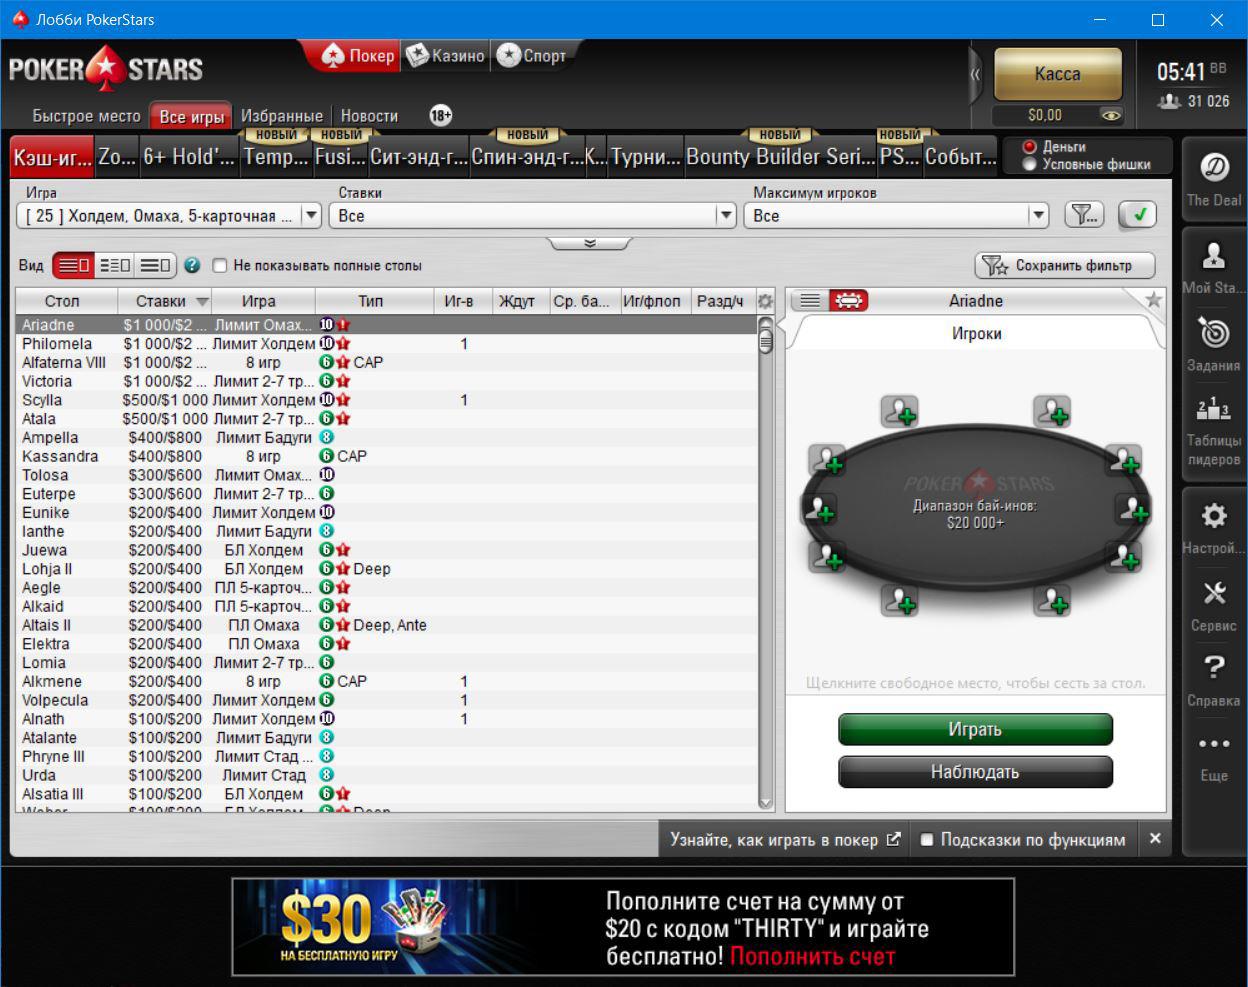 Эталонный дизайн клиента PokerStars.